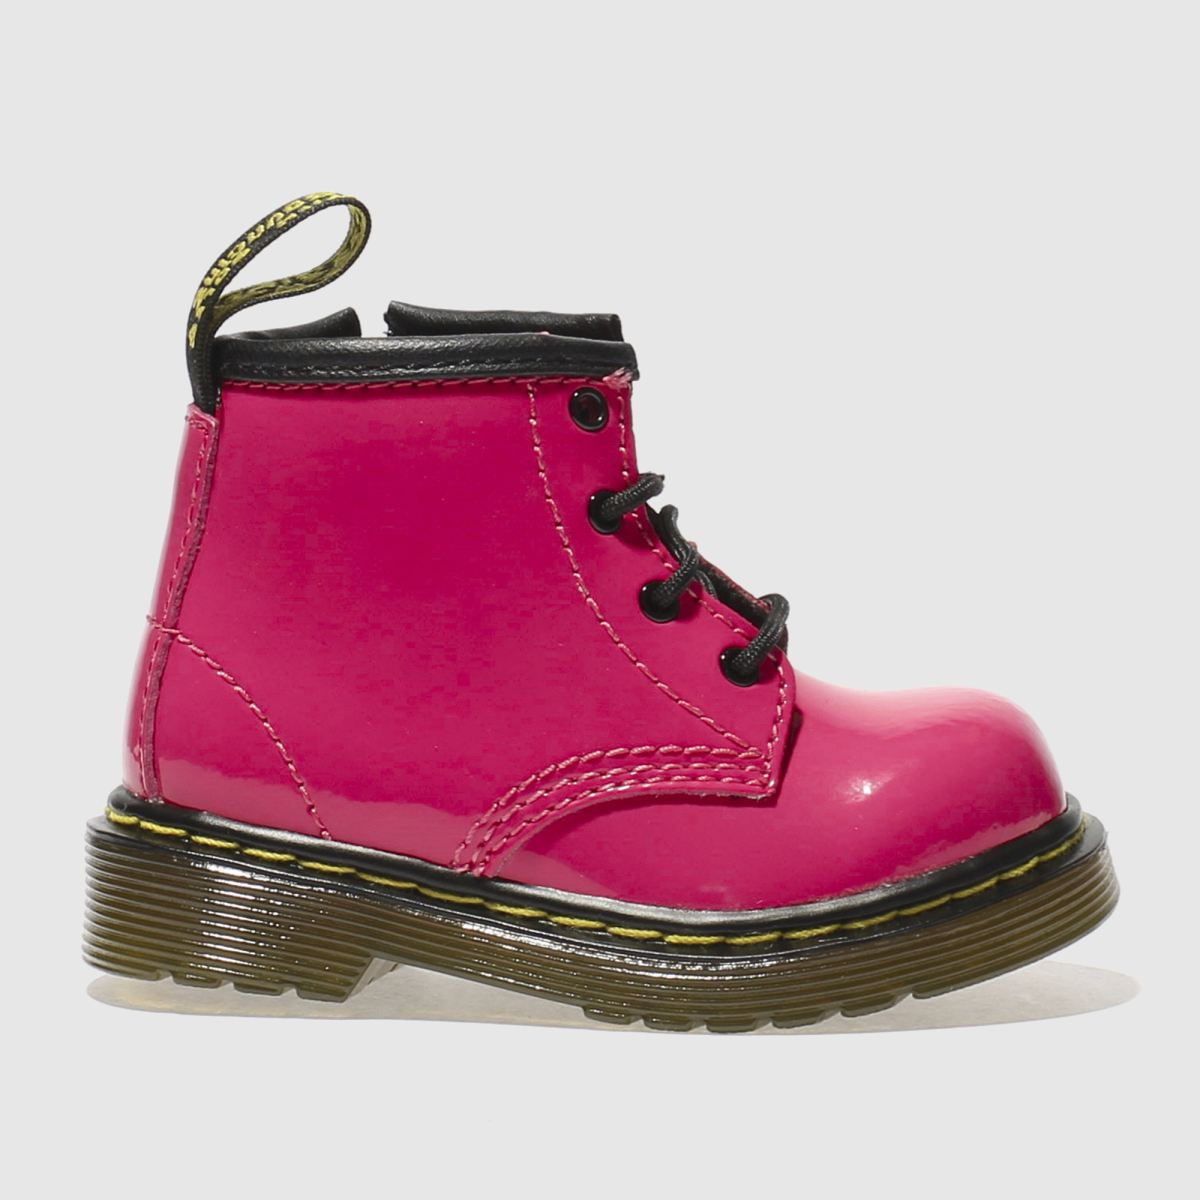 dr martens pink brooklee patent Girls Toddler Boots